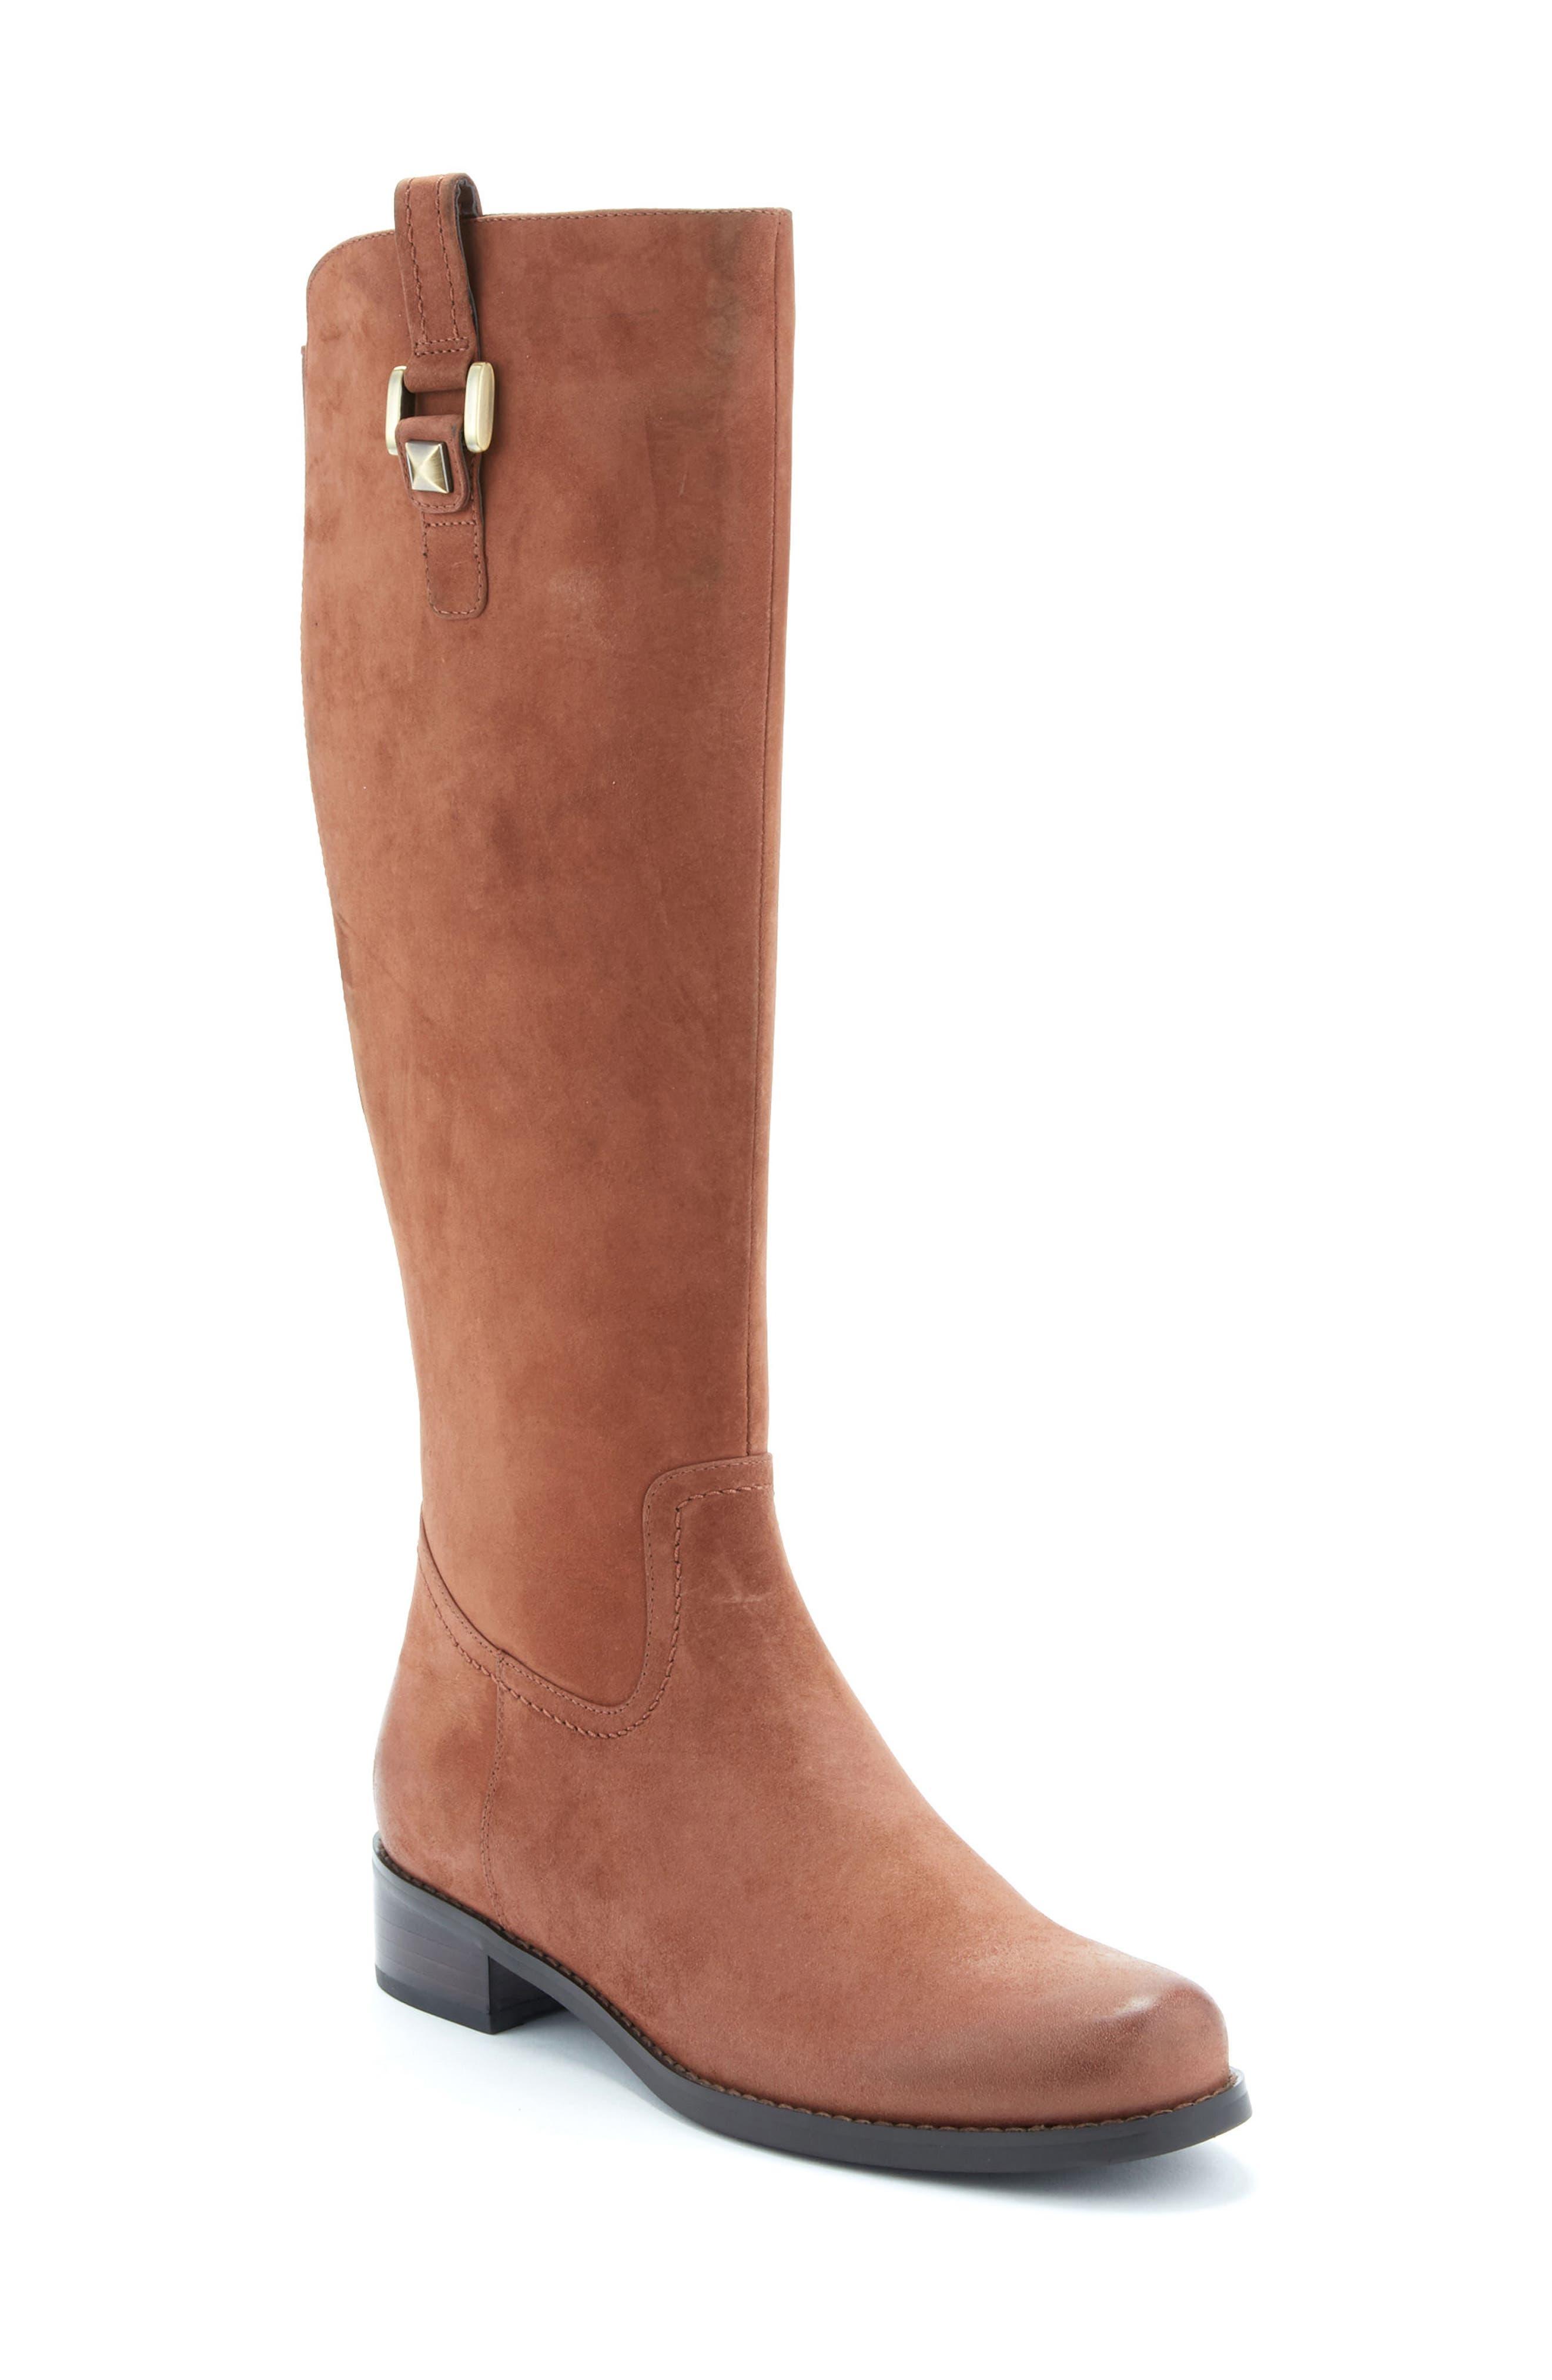 Alternate Image 1 Selected - Blondo 'Velvet' Waterproof Riding Boot (Women) (Regular & Wide Calf)